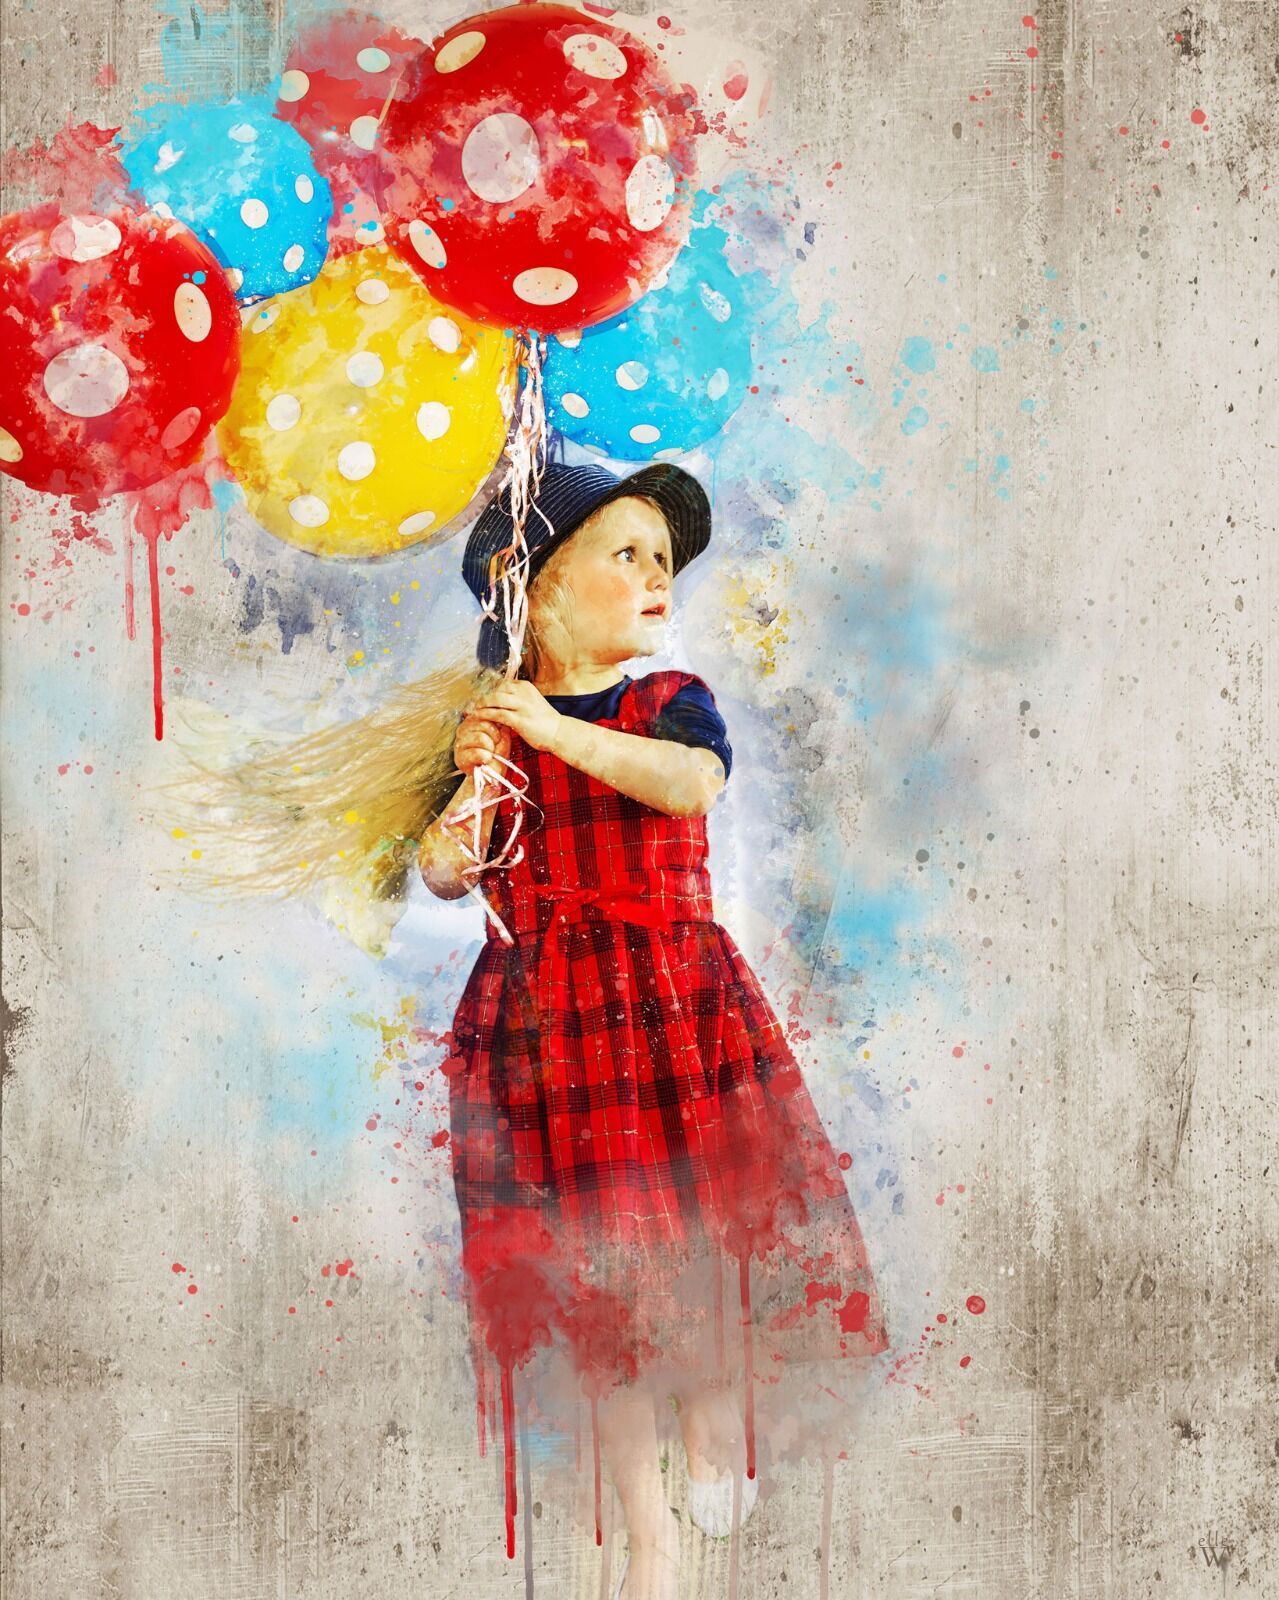 Holding onto balloons - Mixed Art Effect